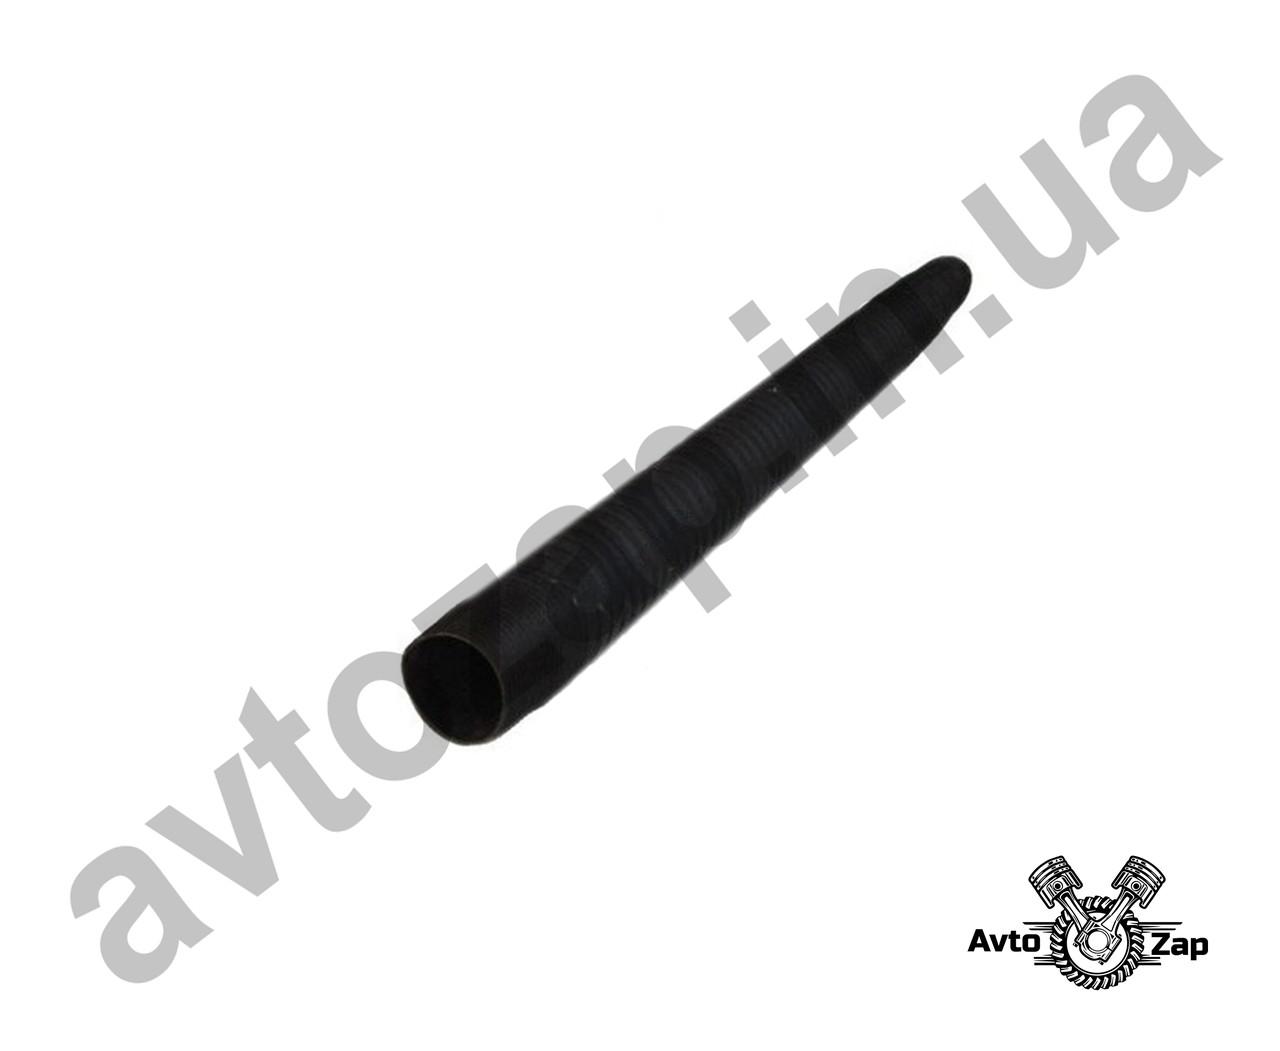 Шланг подвода подогретого воздуха ИЖ-ОДА 2126, 2717